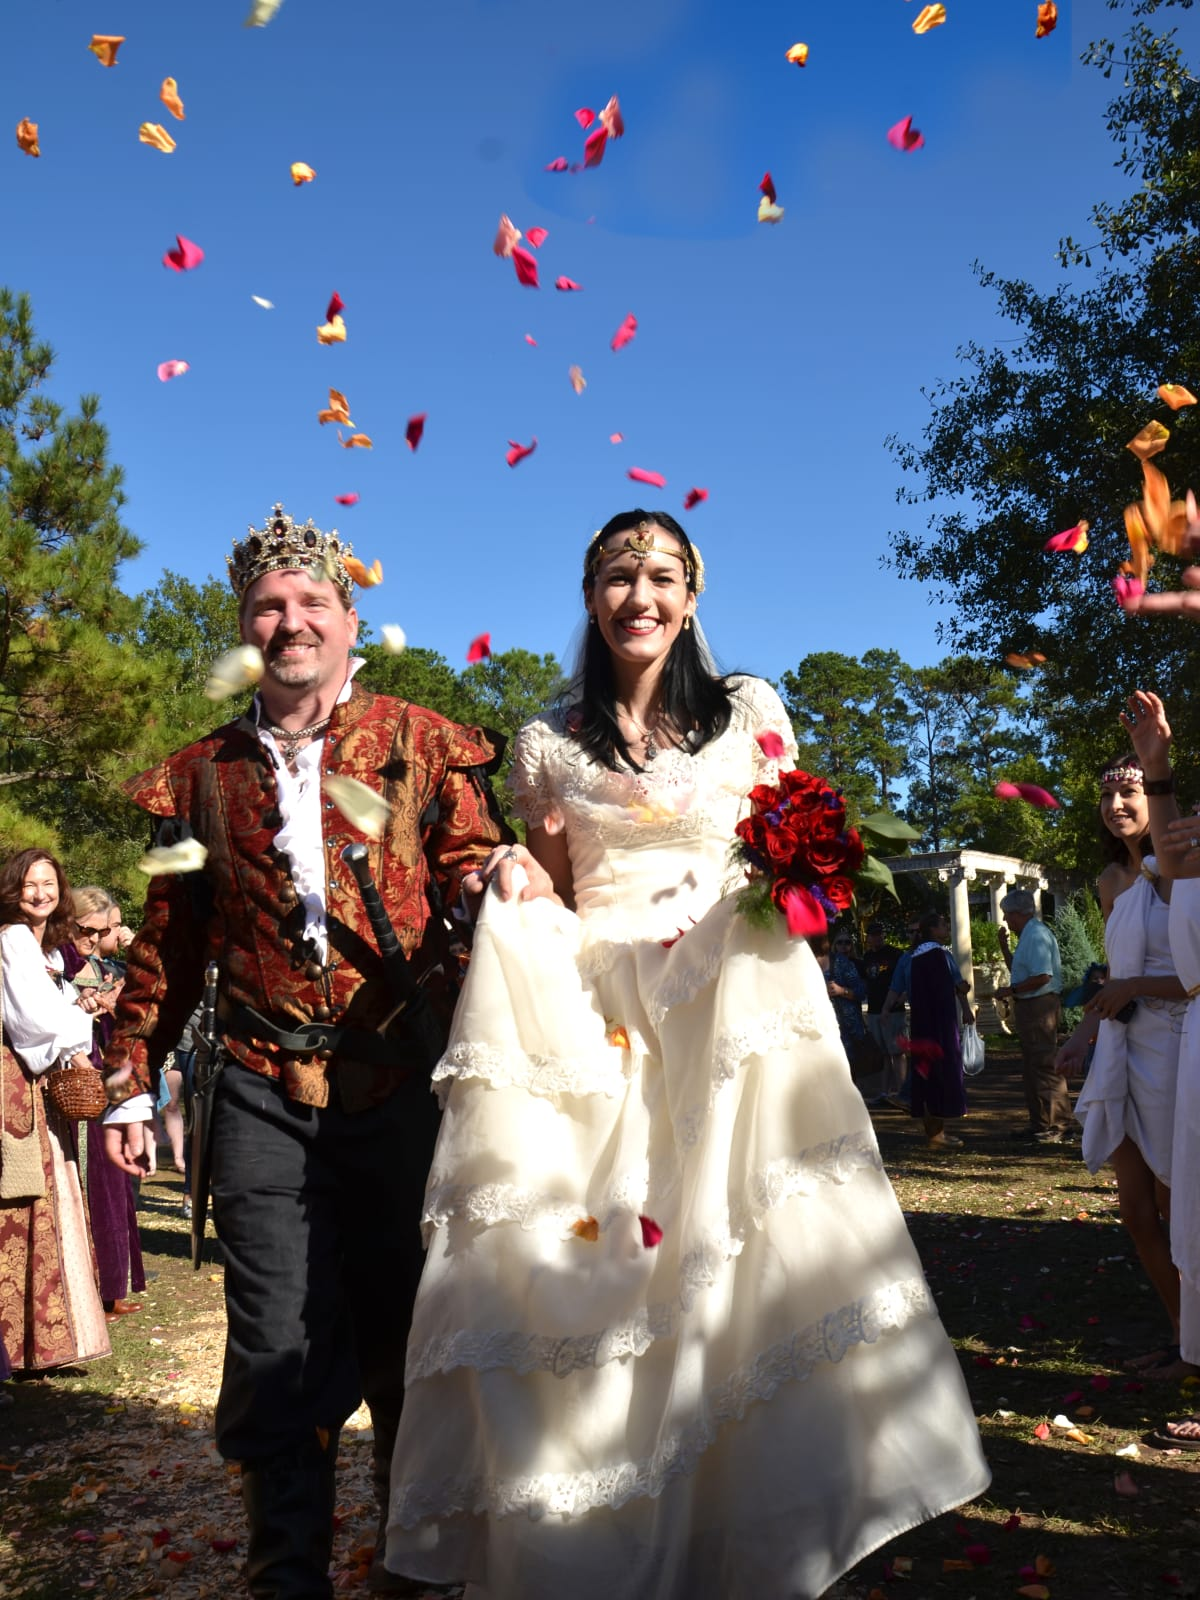 Renaissance Festival Weddings, Feb. 2016 Logan Knight, Sarah Wheeler